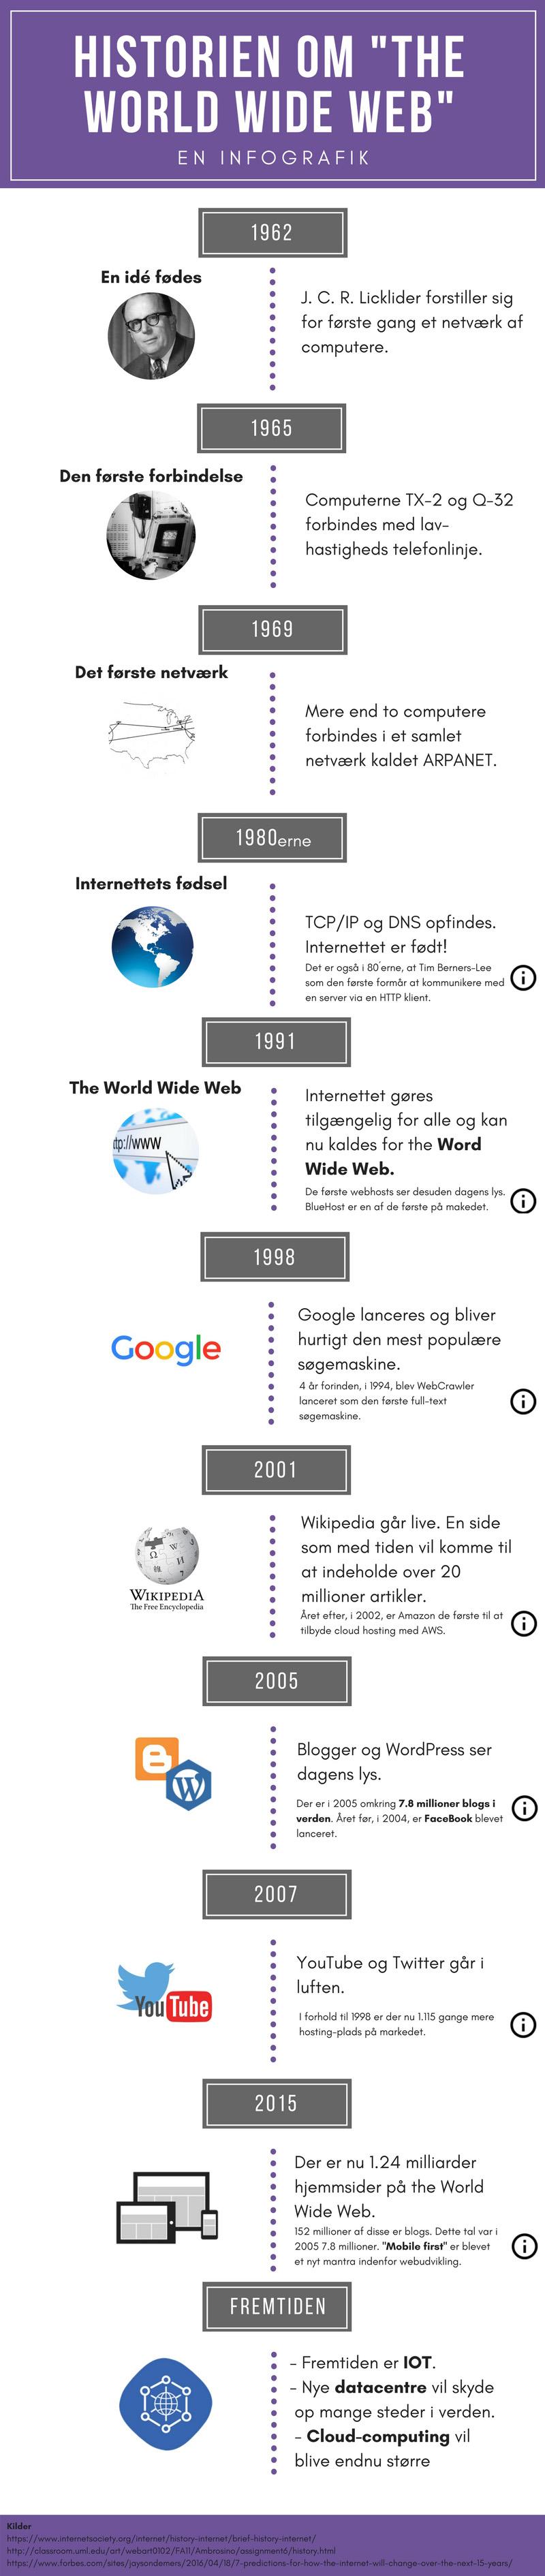 Historien om The World Wide Web